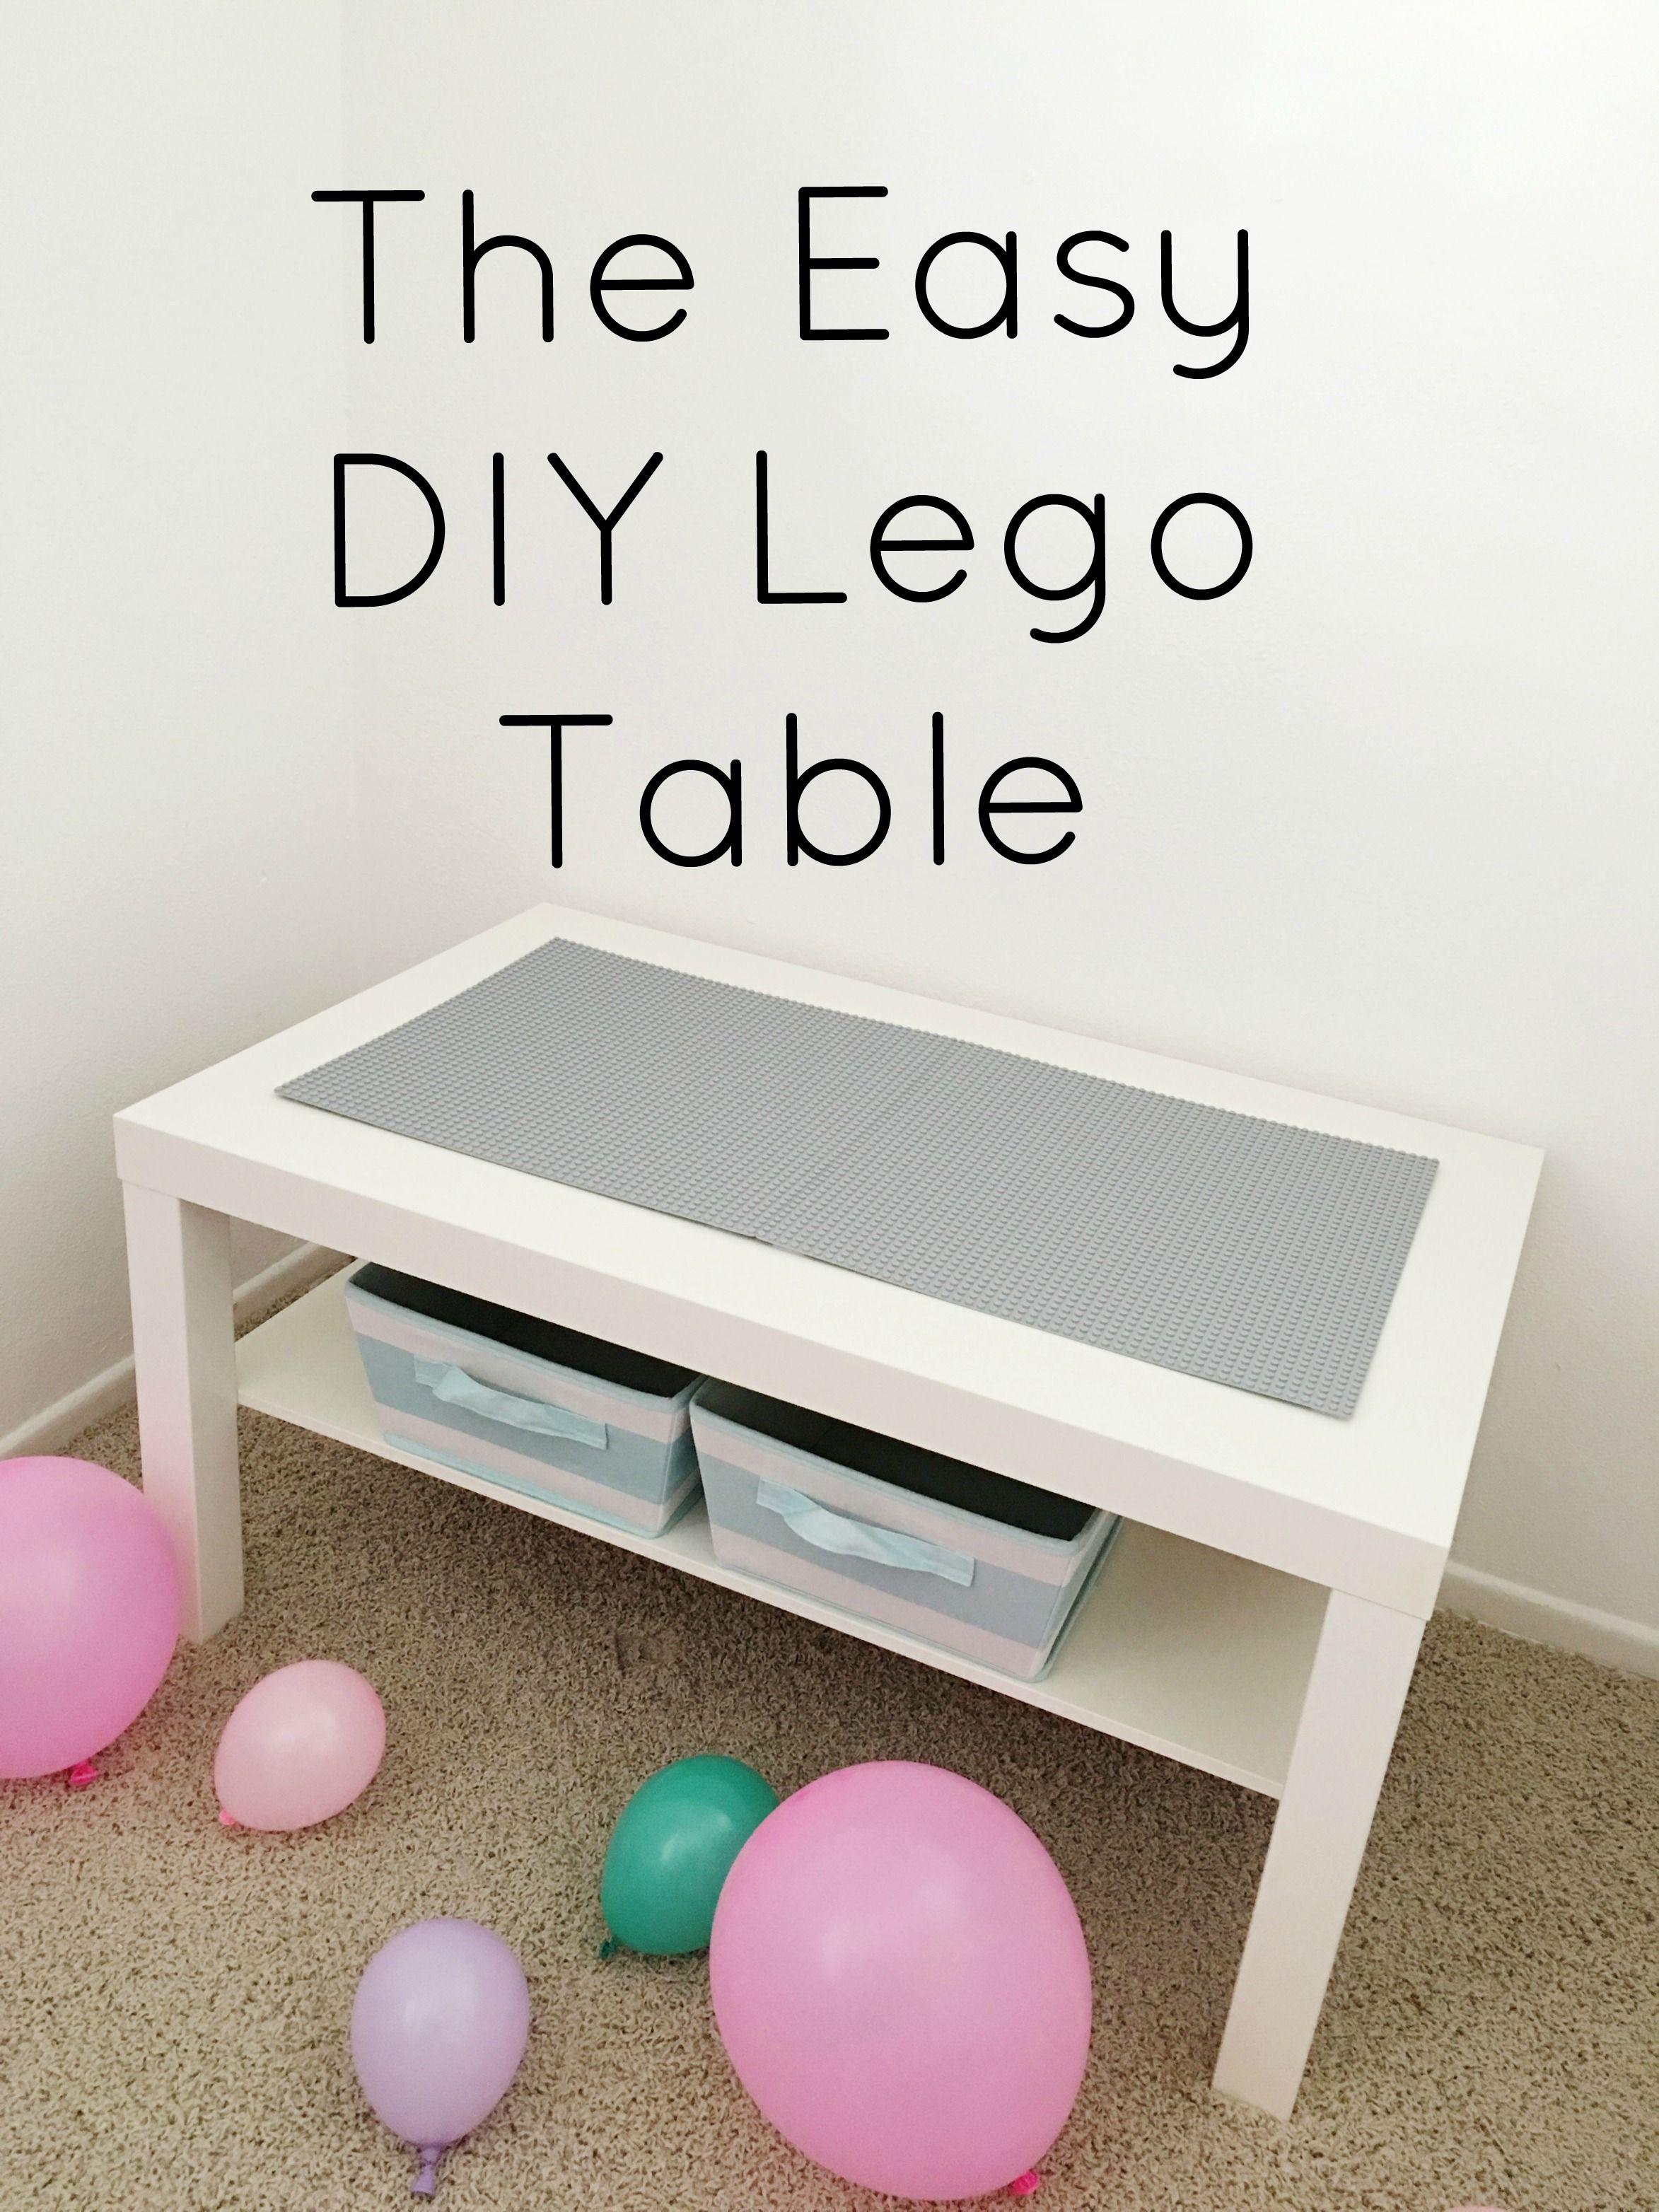 Diy lego coffee table - The Easiest Diy Lego Table All You Need Ikea Coffee Table Lego Baseplates Velcro